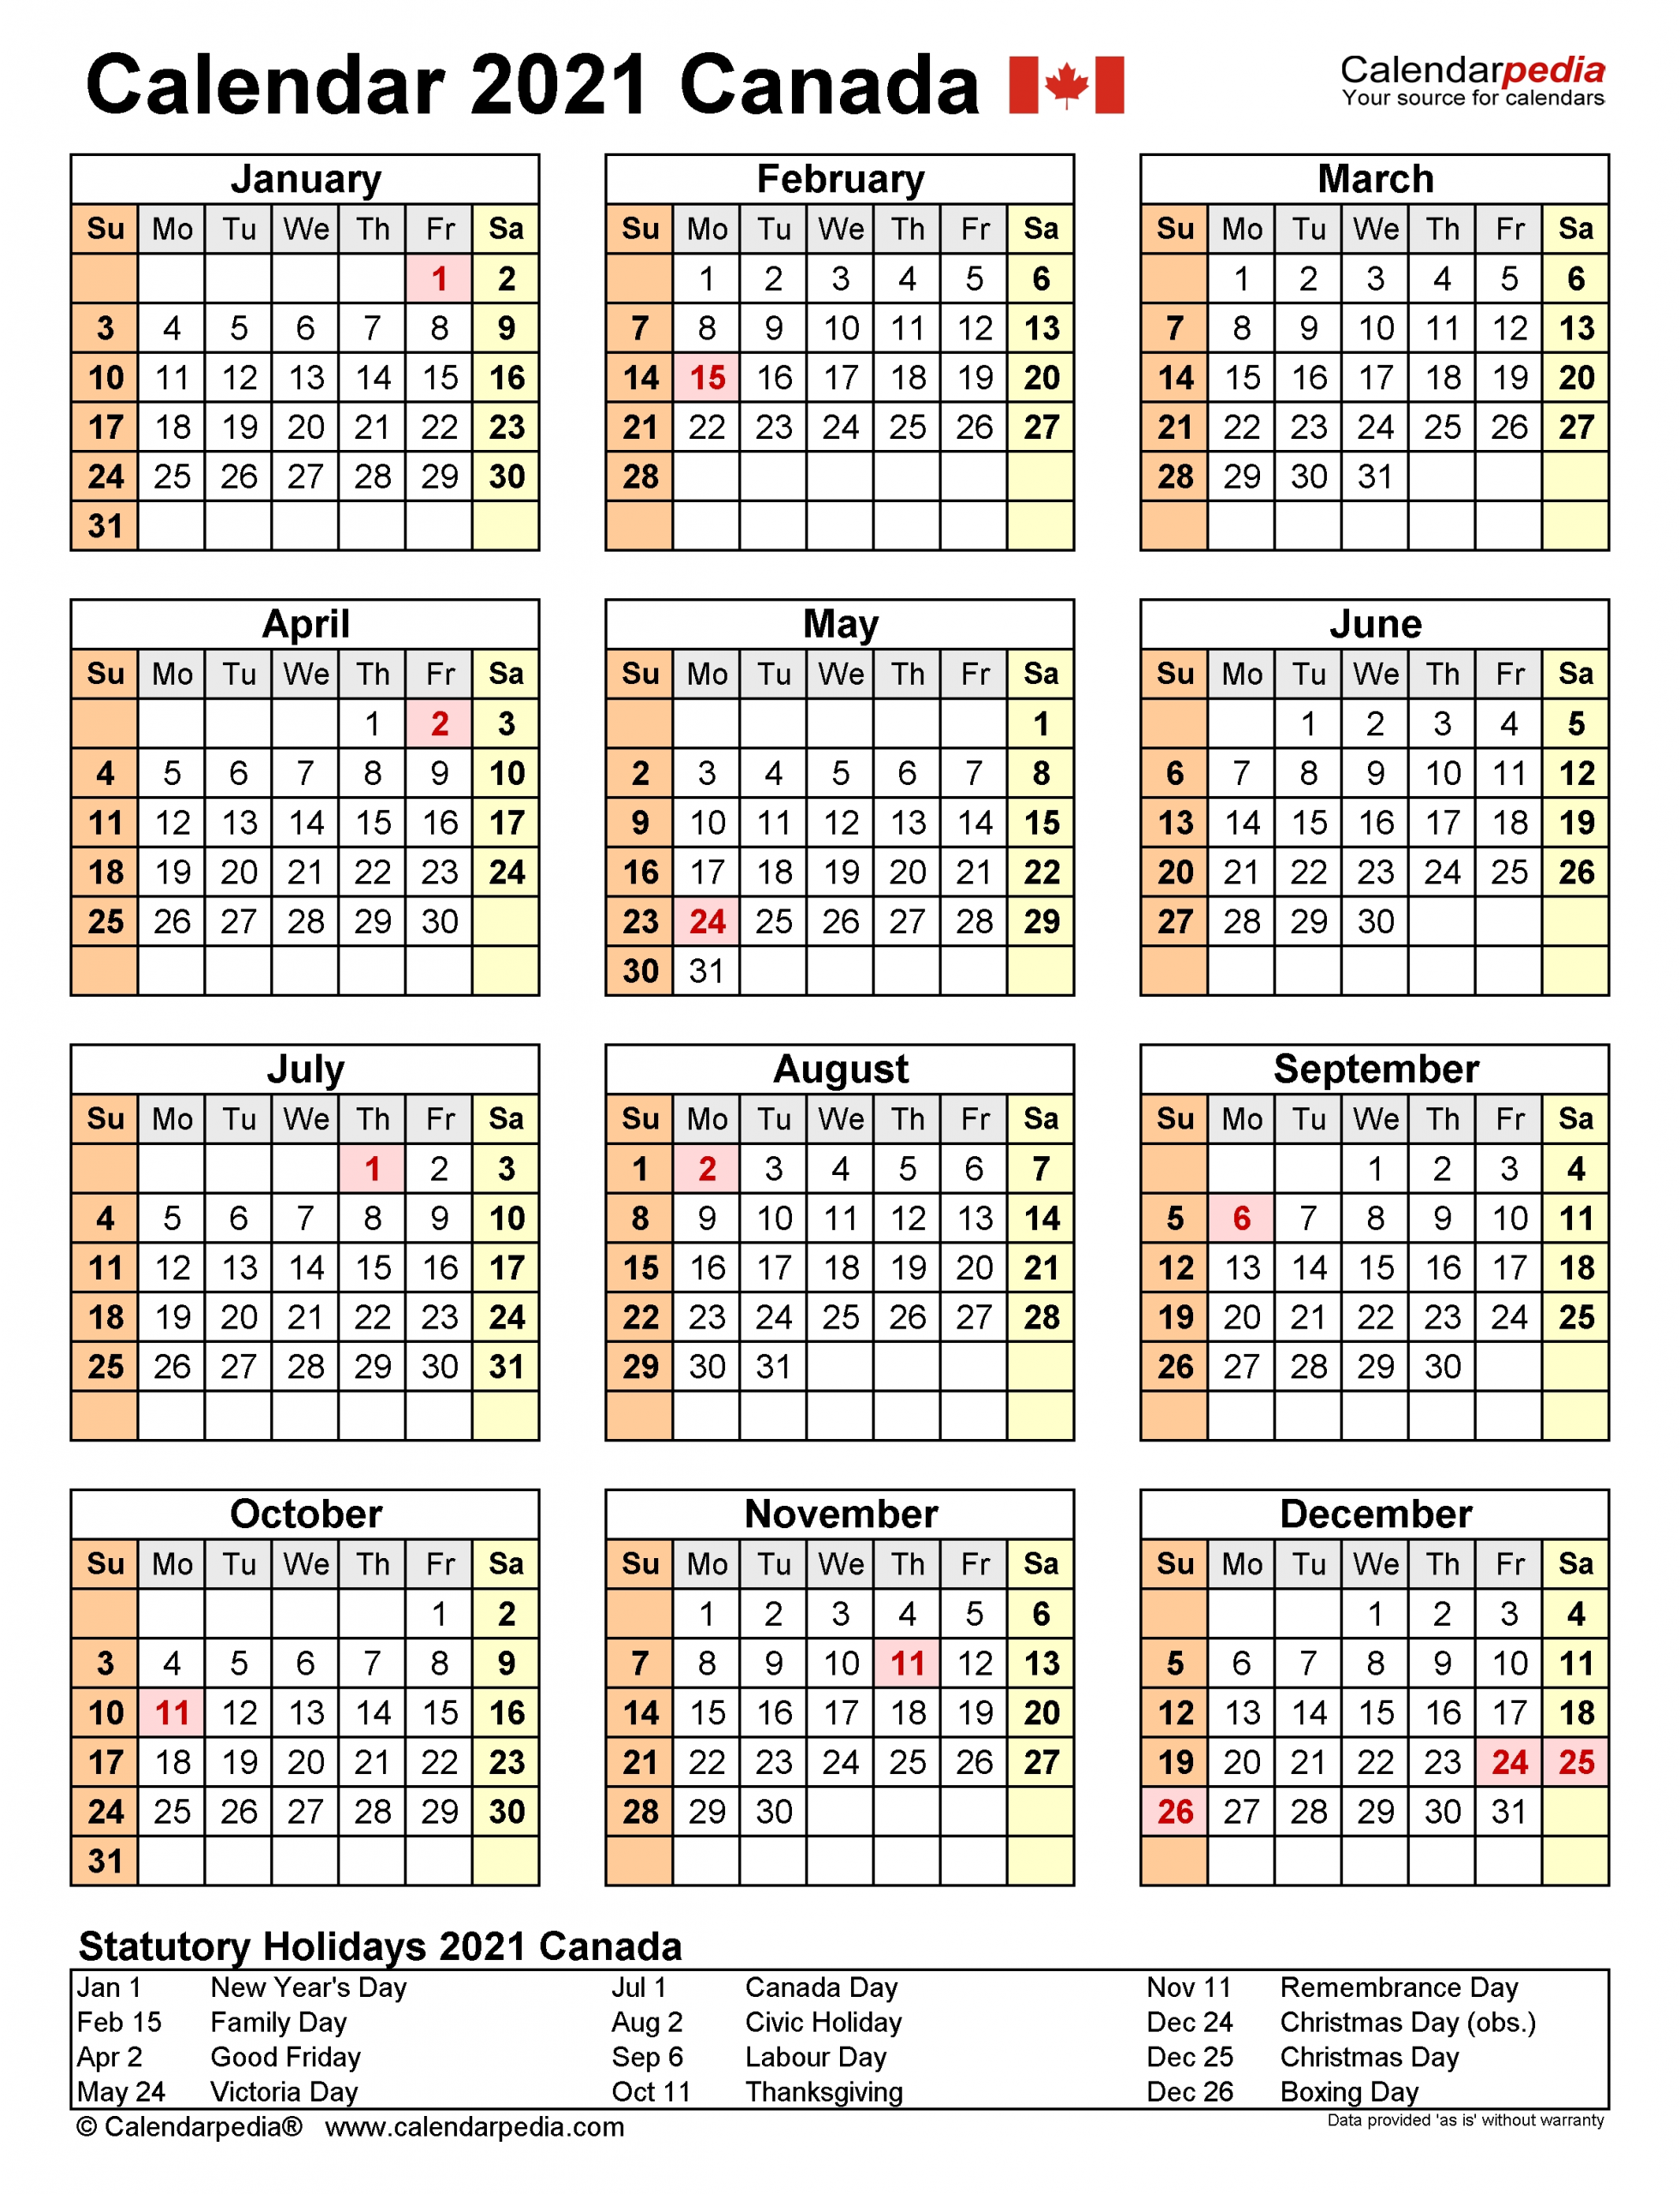 Canada Calendar 2021 - Free Printable Excel Templates-2021 Calendar For Staff Vacation